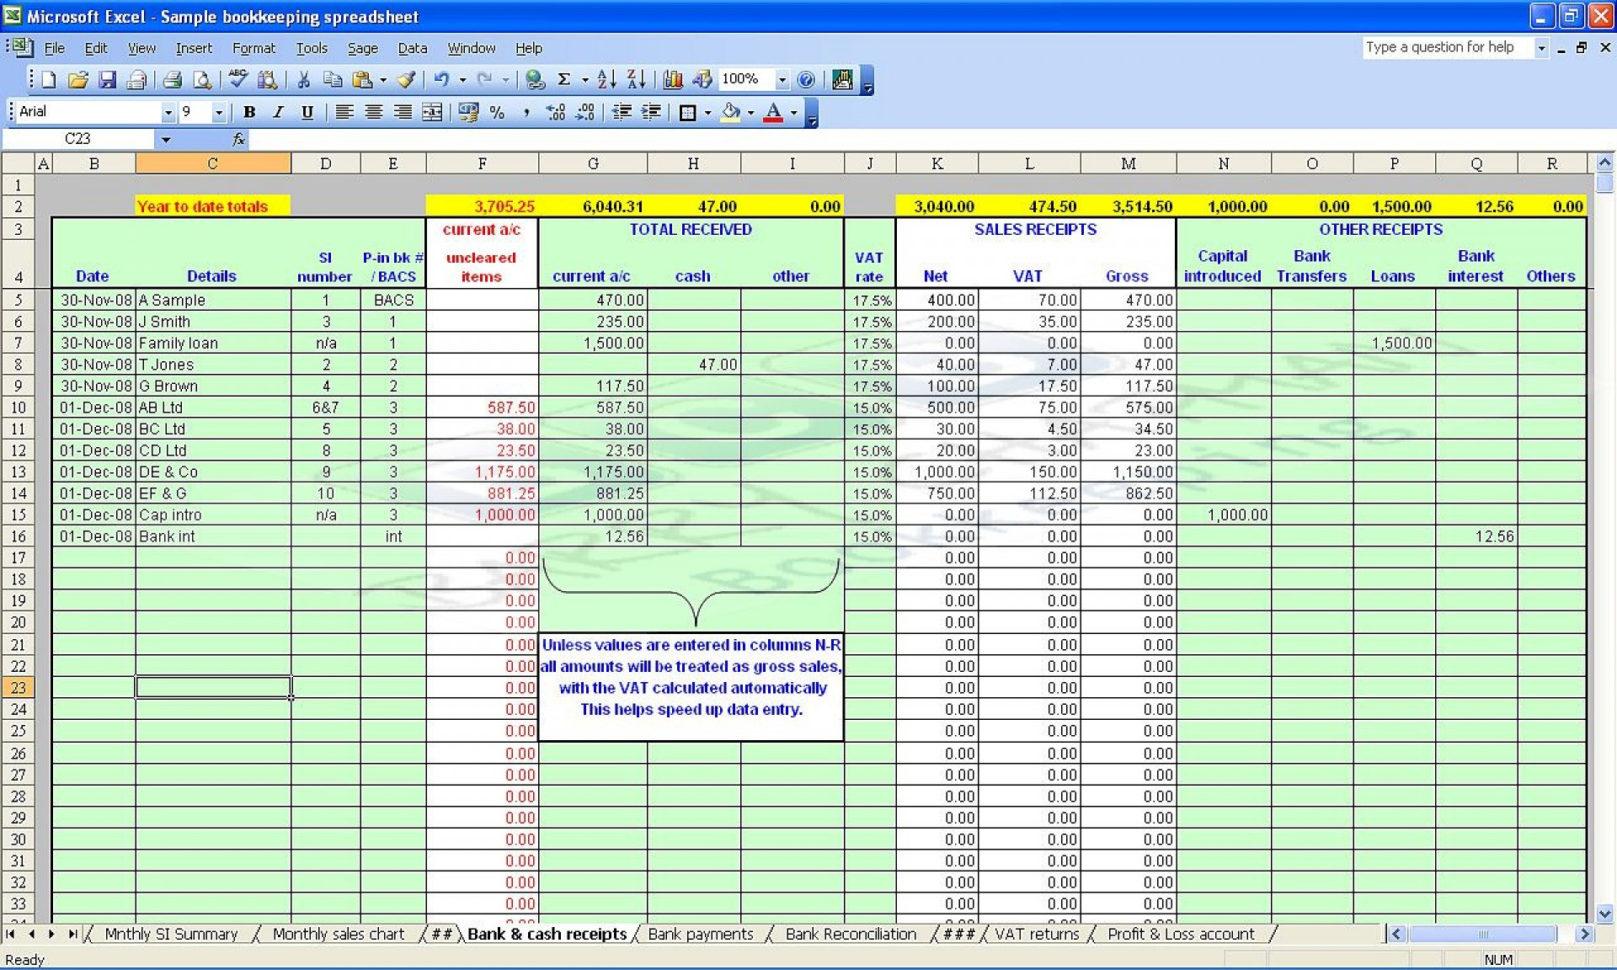 Free Vat Spreadsheet Template In 015 Accounts Receivable Excel Spreadsheet Template Ideas Free